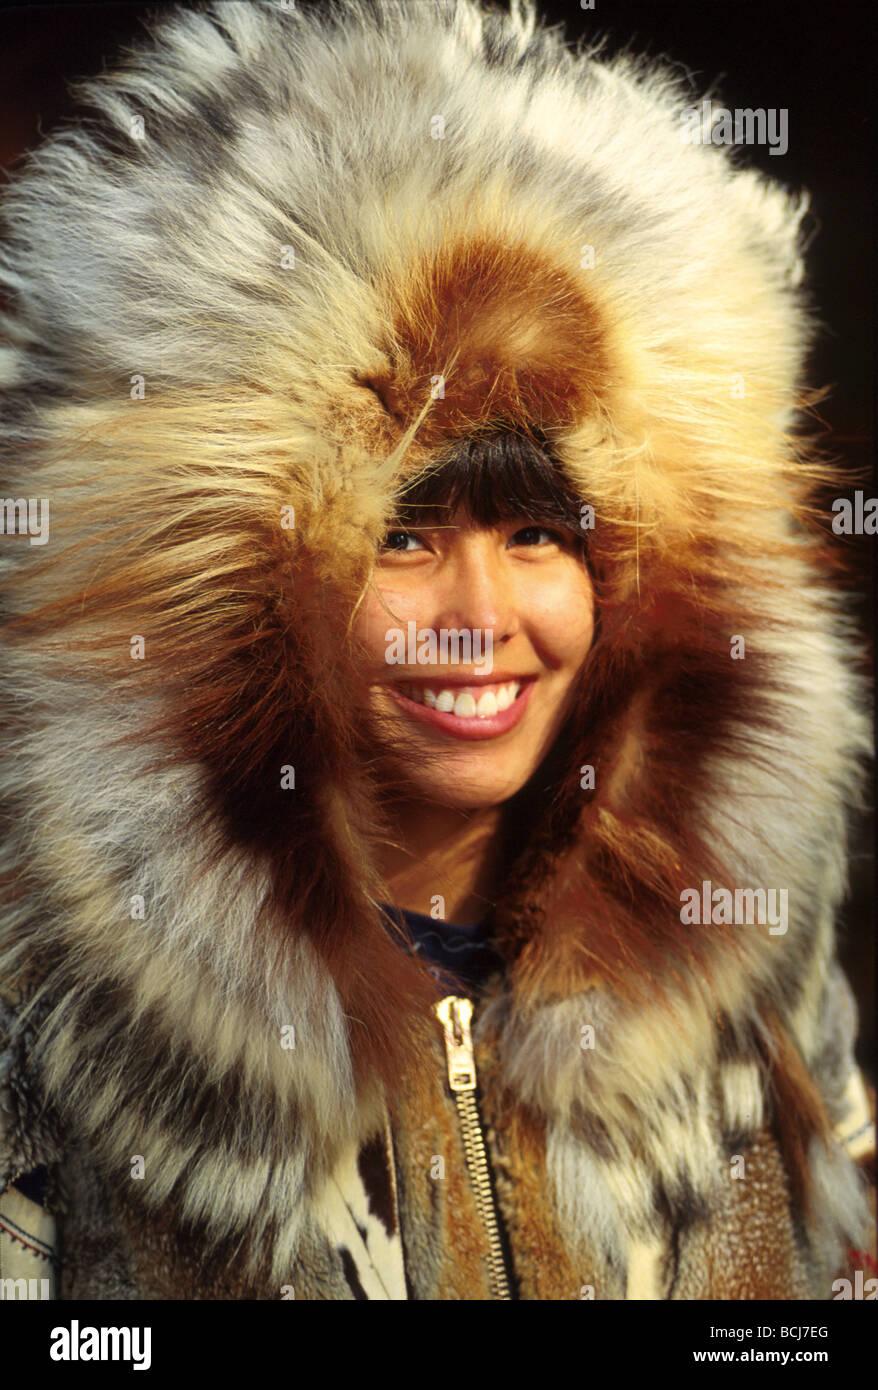 Alaska native girl in fur stock photos alaska native - Interior women s health fairbanks ak ...